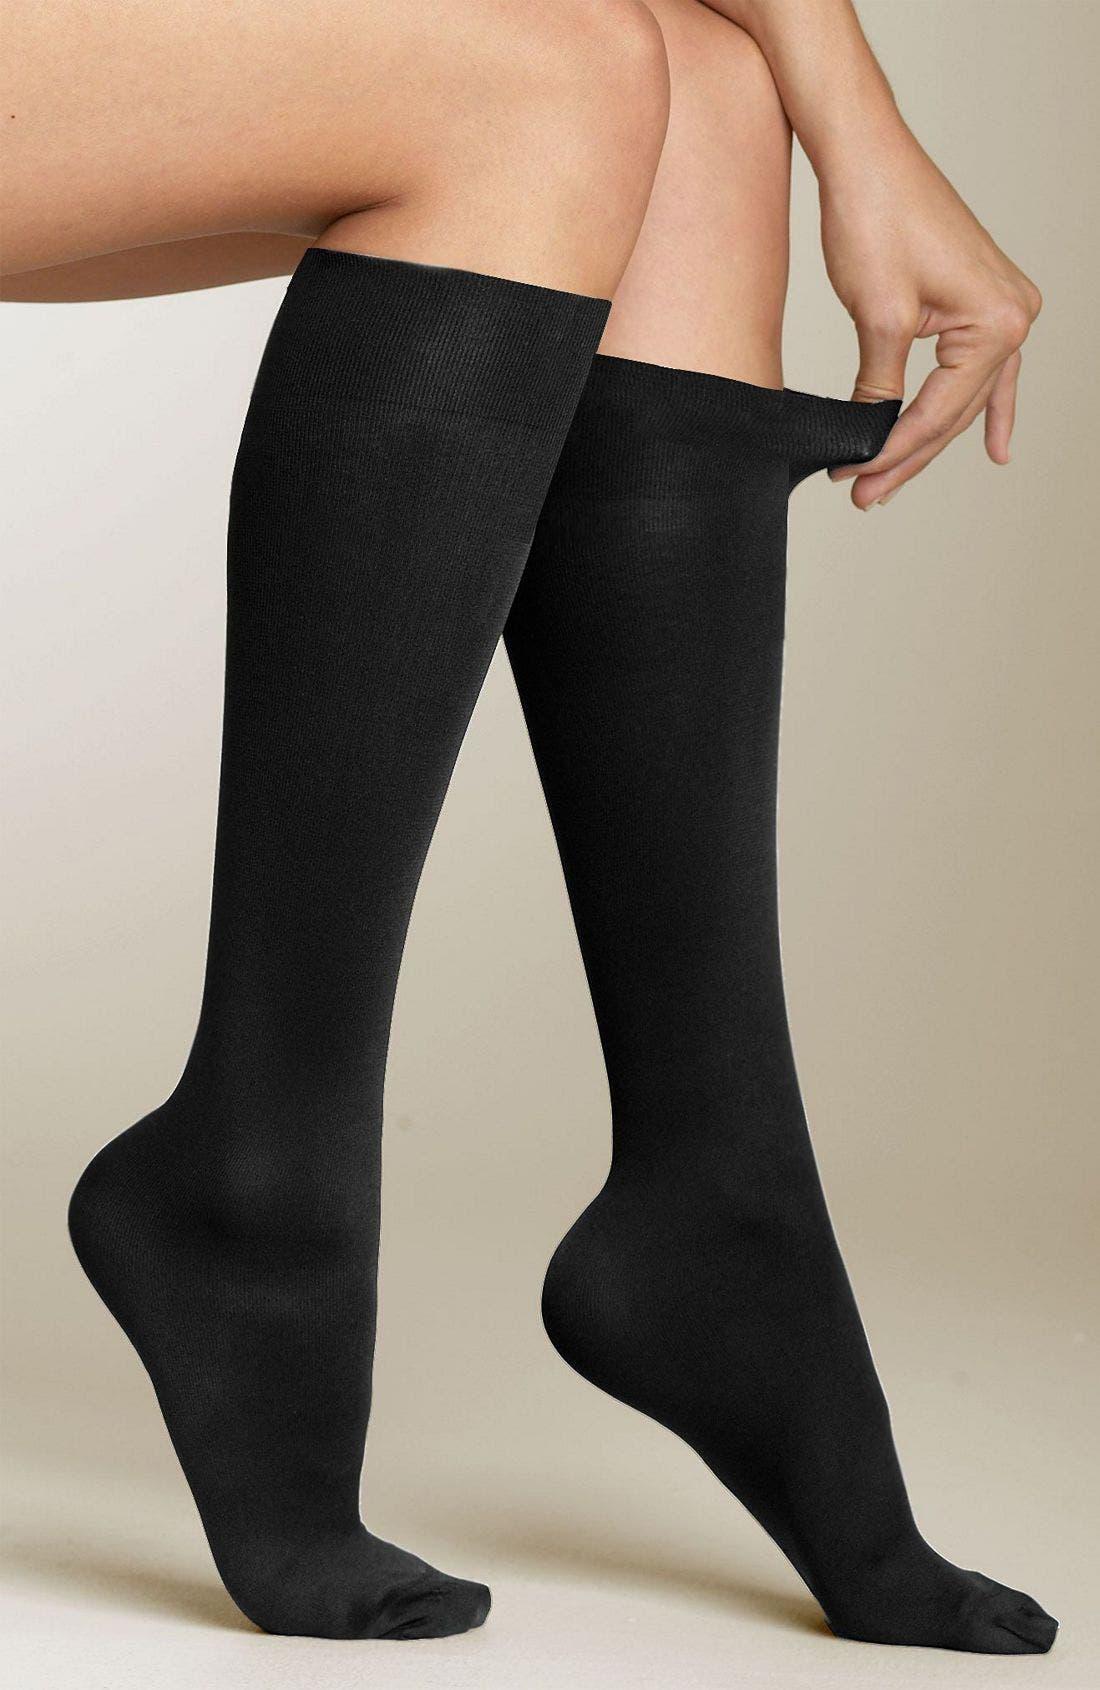 Alternate Image 1 Selected - SPANX® Topless Trouser Socks